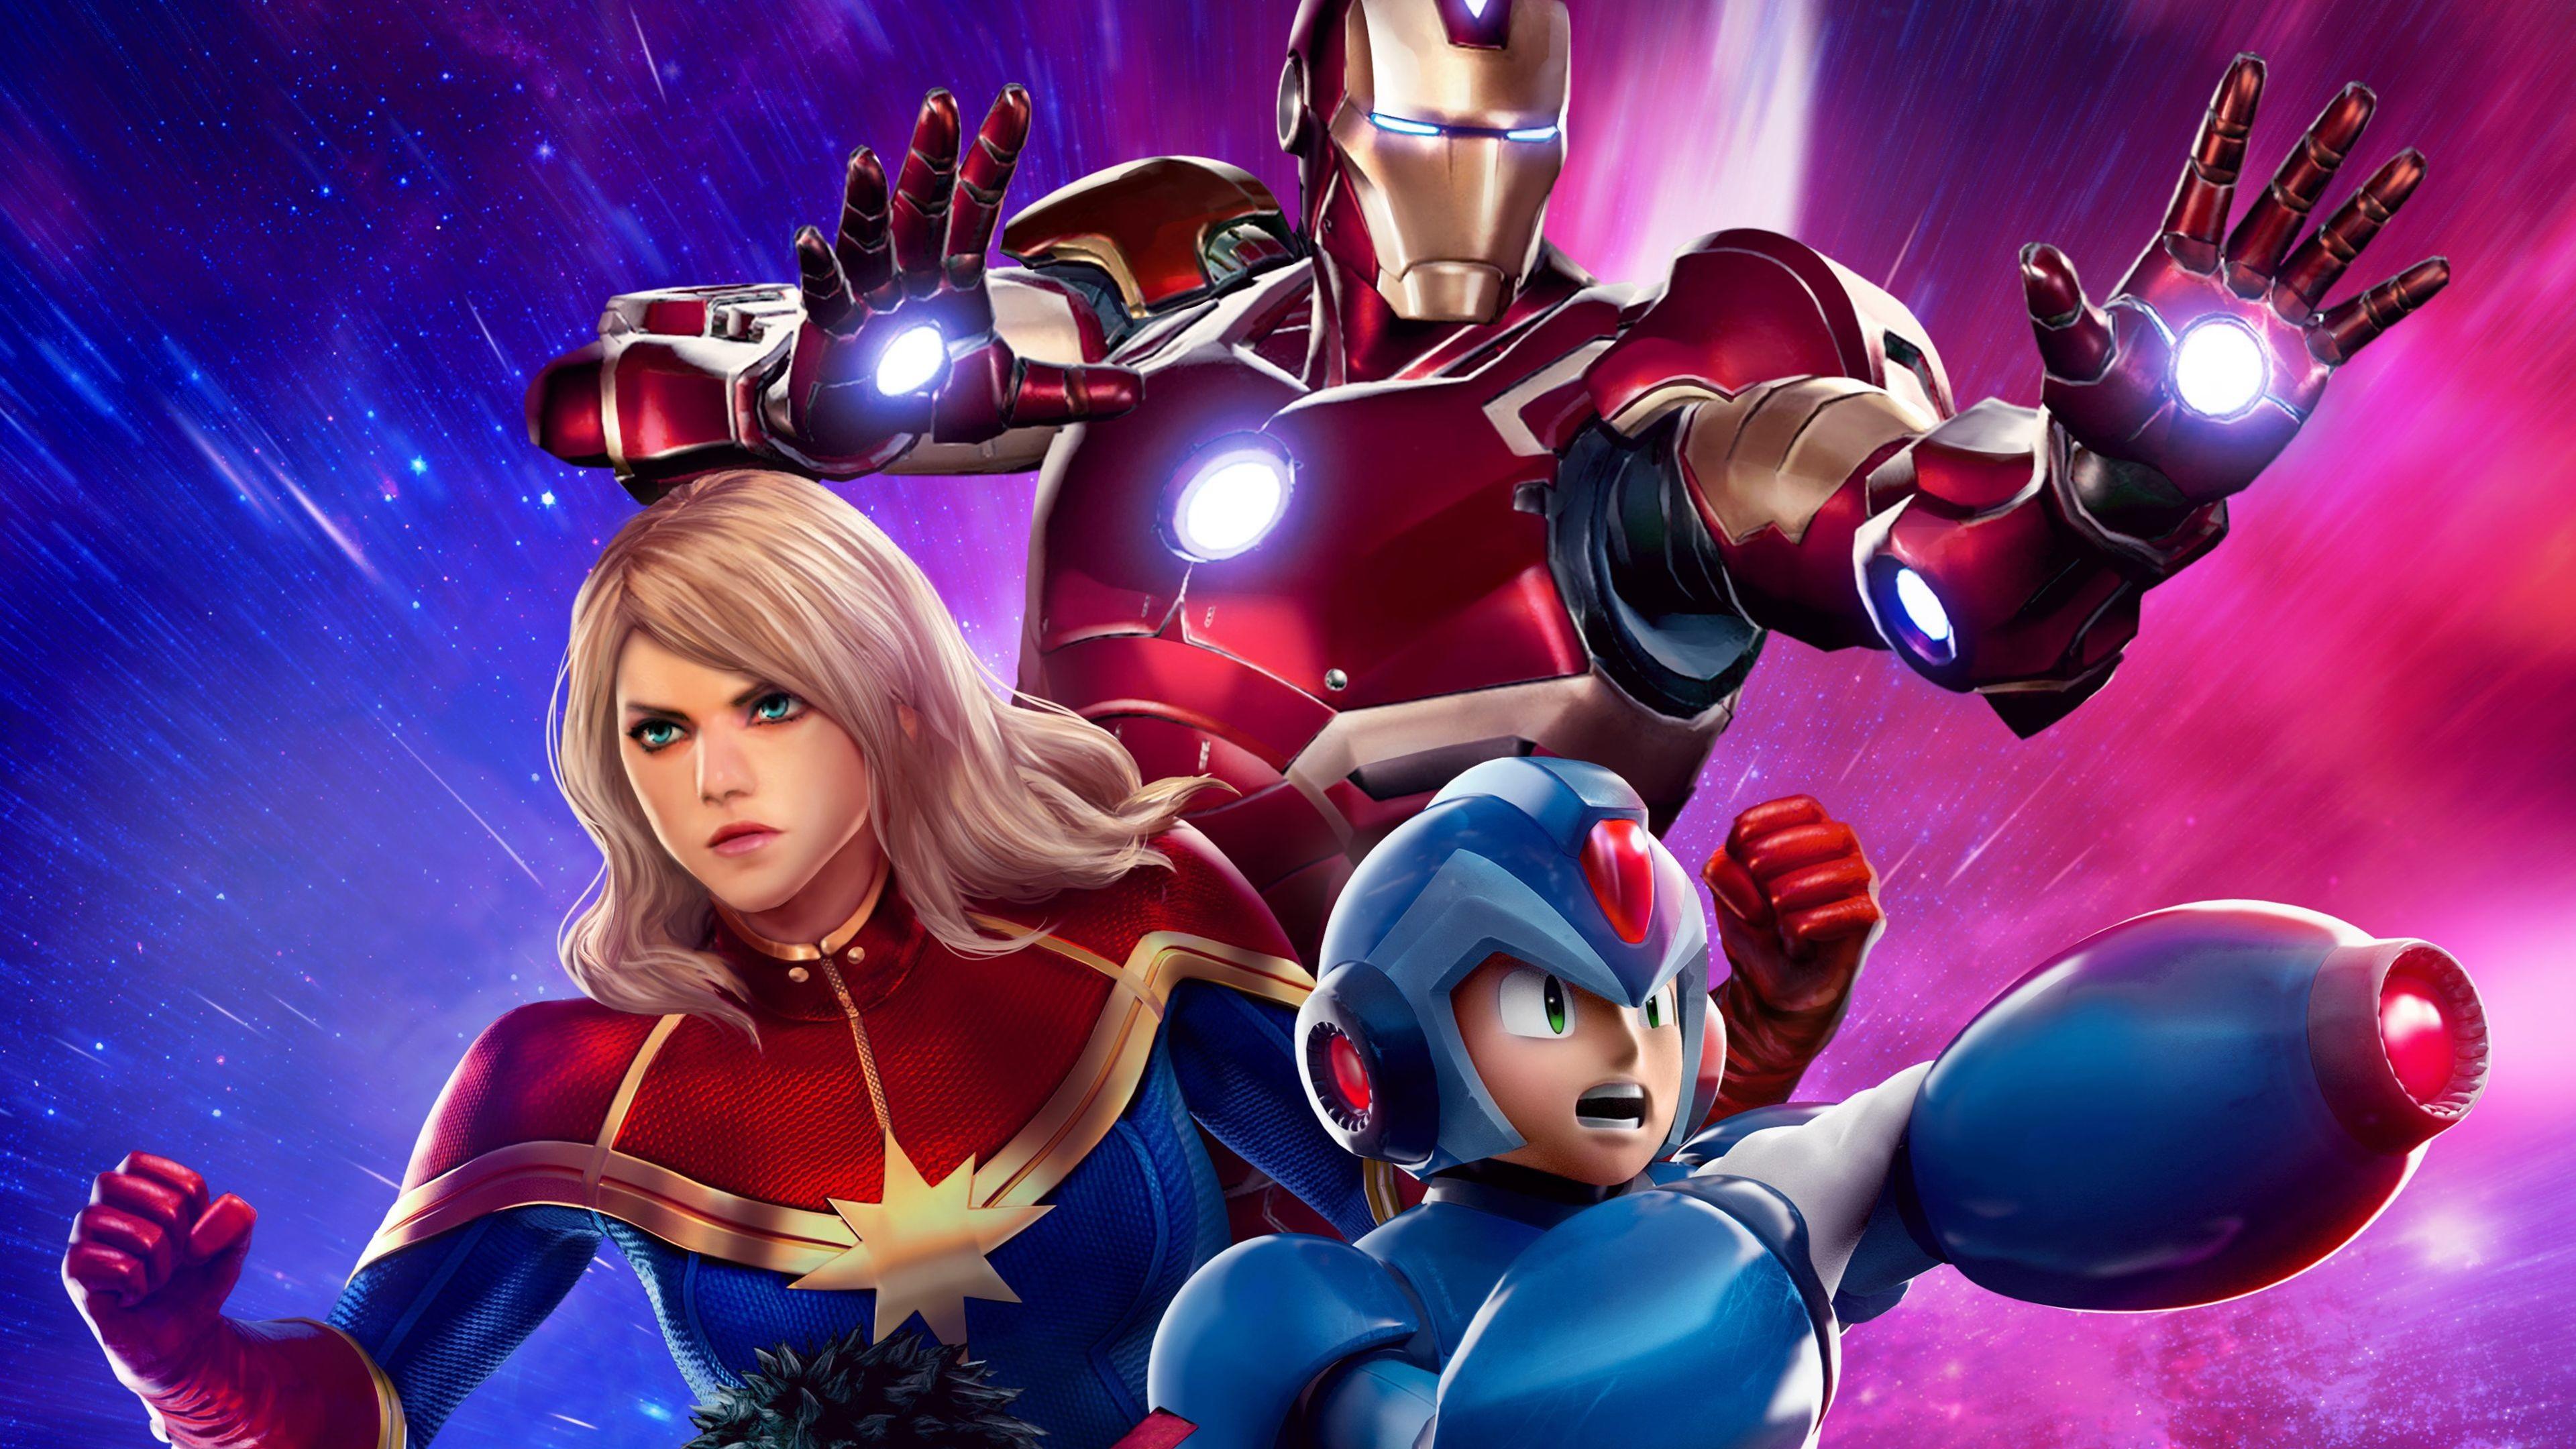 Res: 3840x2160, Awesome Iron Man Captain Marvel Mega Man 4K Marvel vs. Capcom: Infinite  wallpaper